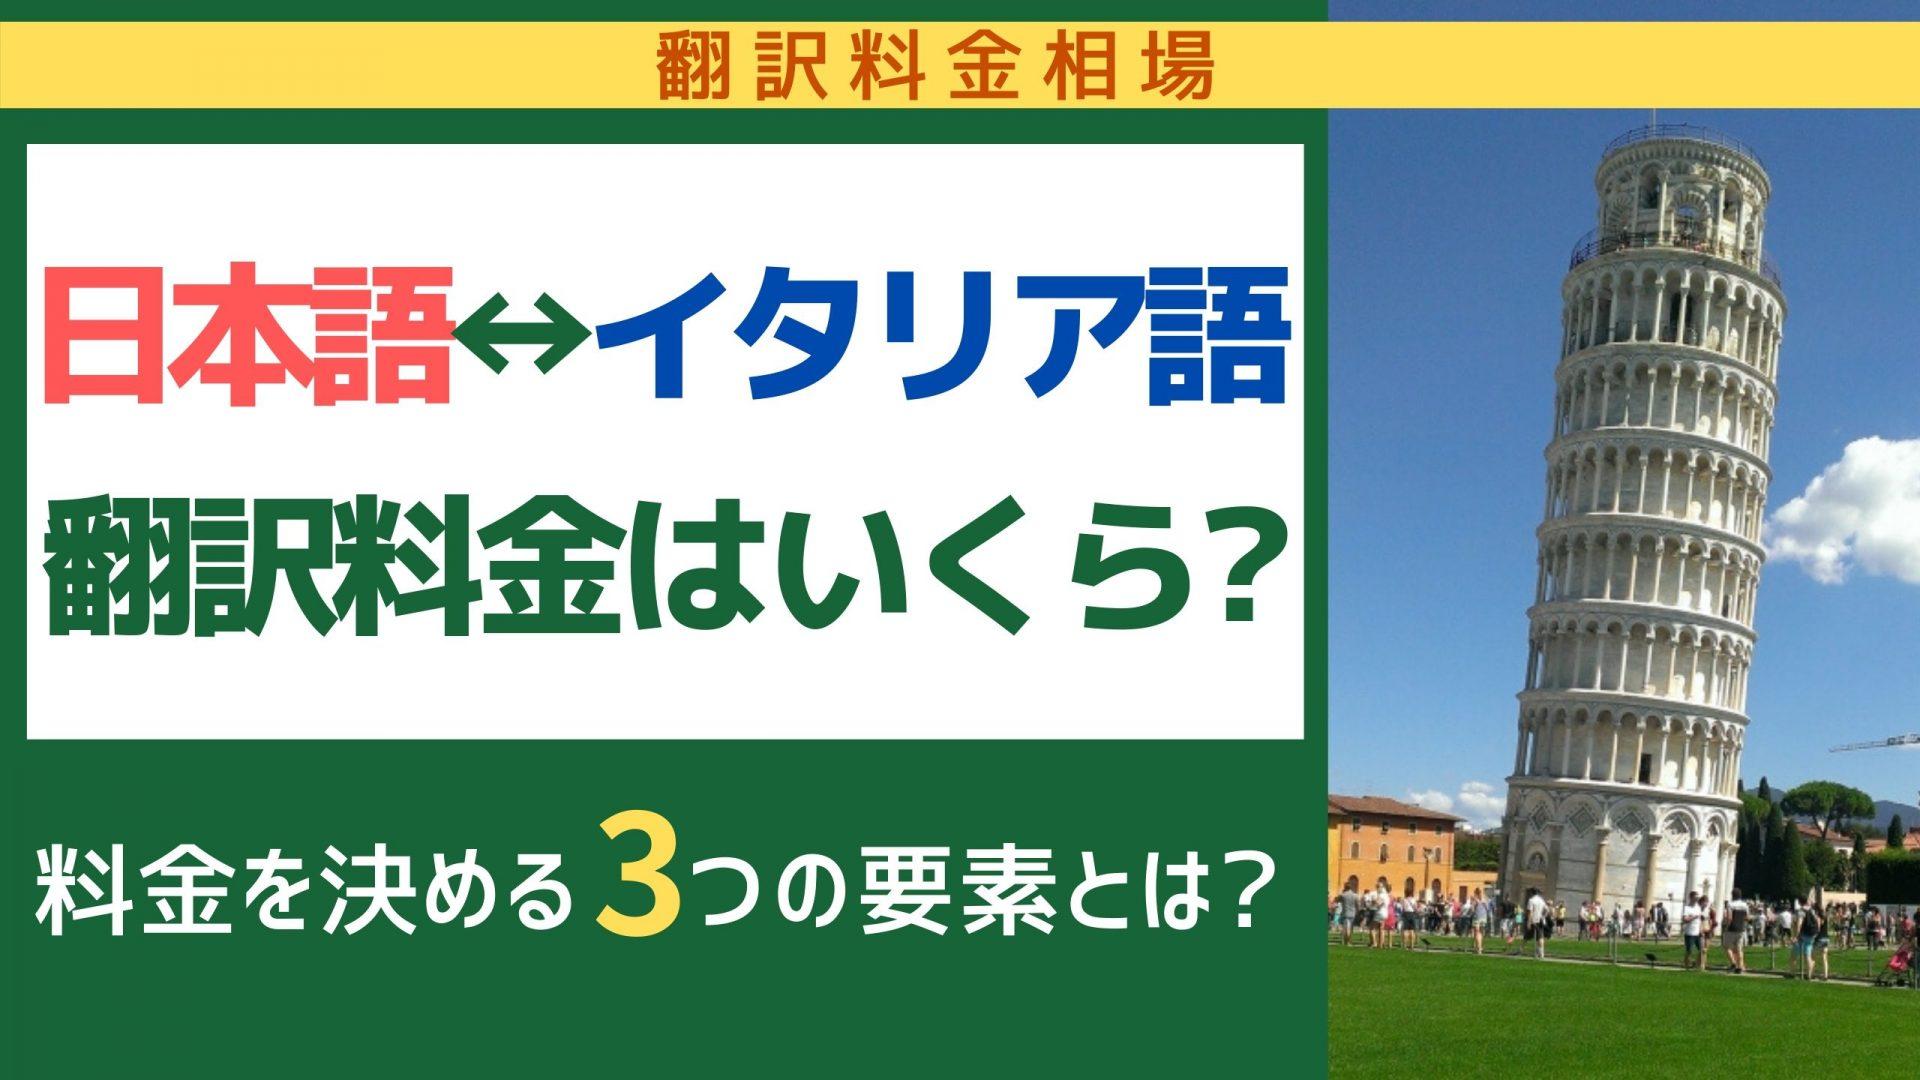 39cc791a3fa390f4037f88d50d8c2e12 - 日本語からイタリア語、イタリア語から日本語への翻訳料金の相場は?